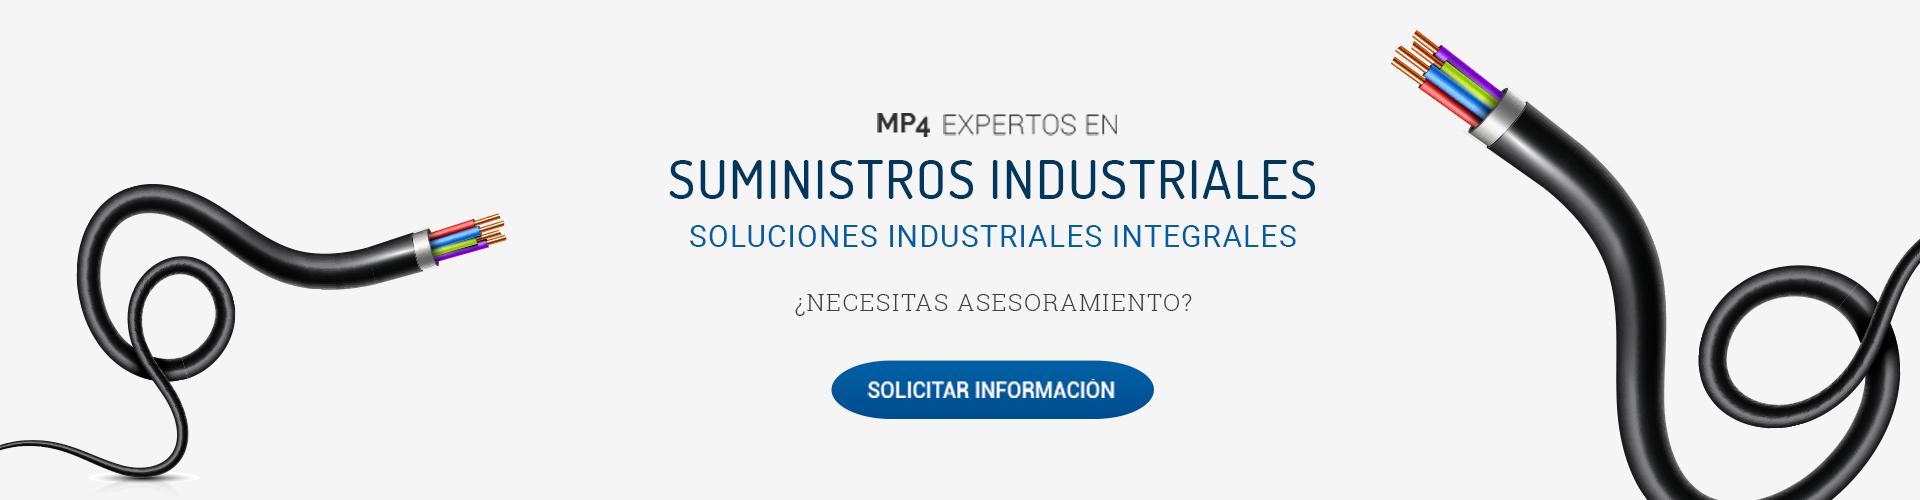 Suministros industriales